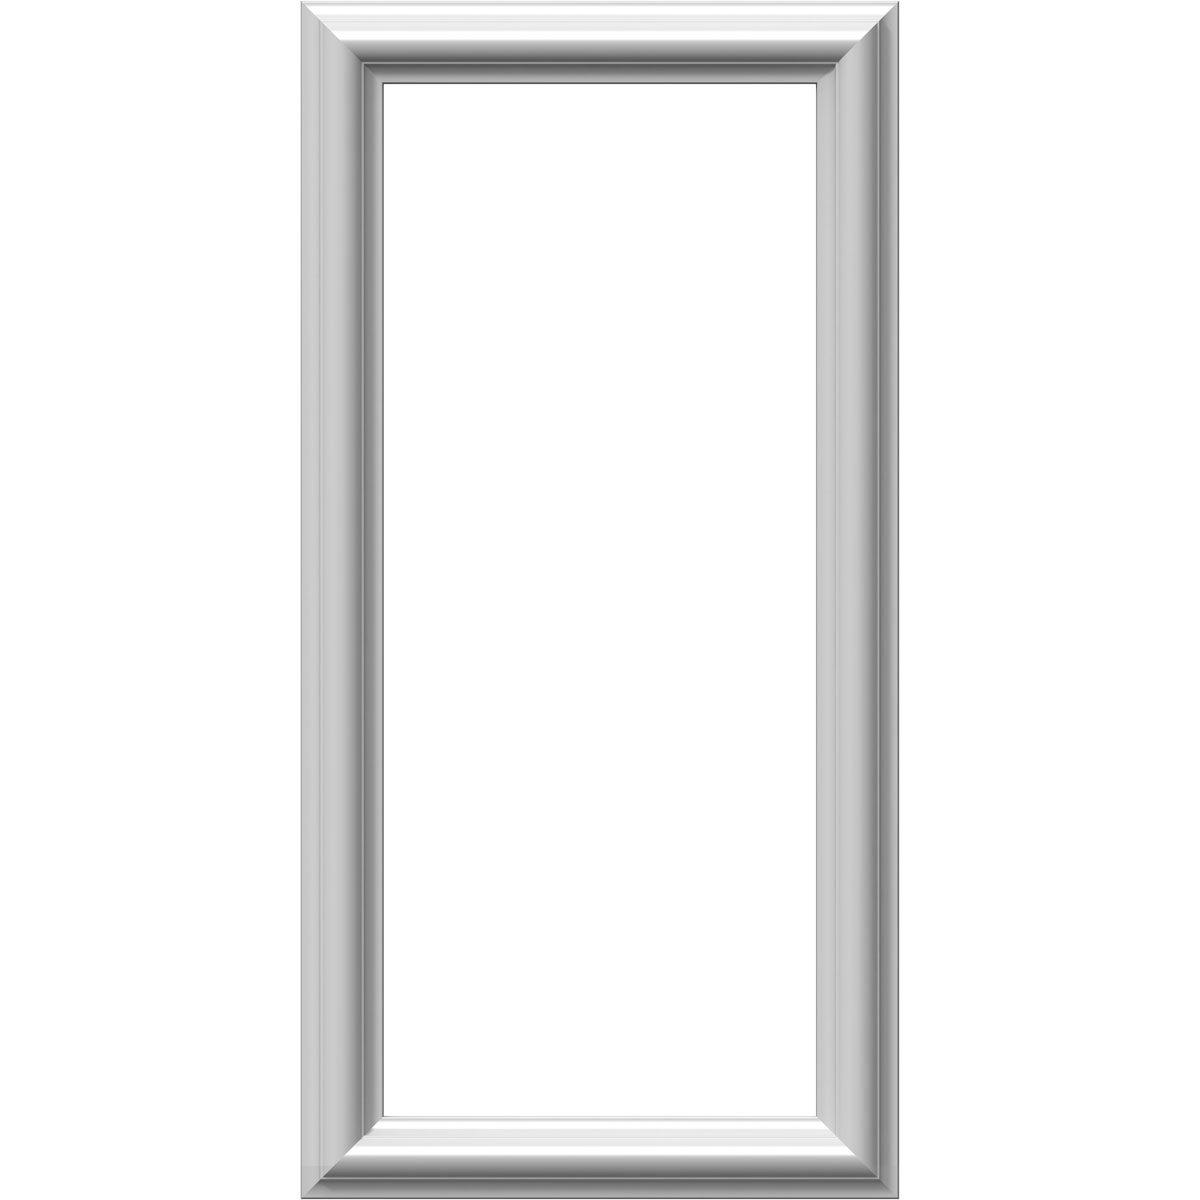 Ekena Millwork PNL24X28AS-01-CASE-4 24 inch W x 28 inch H x 1/2 inch P Ashford Molded Classic Wainscot Wall Panel (4-Pack),